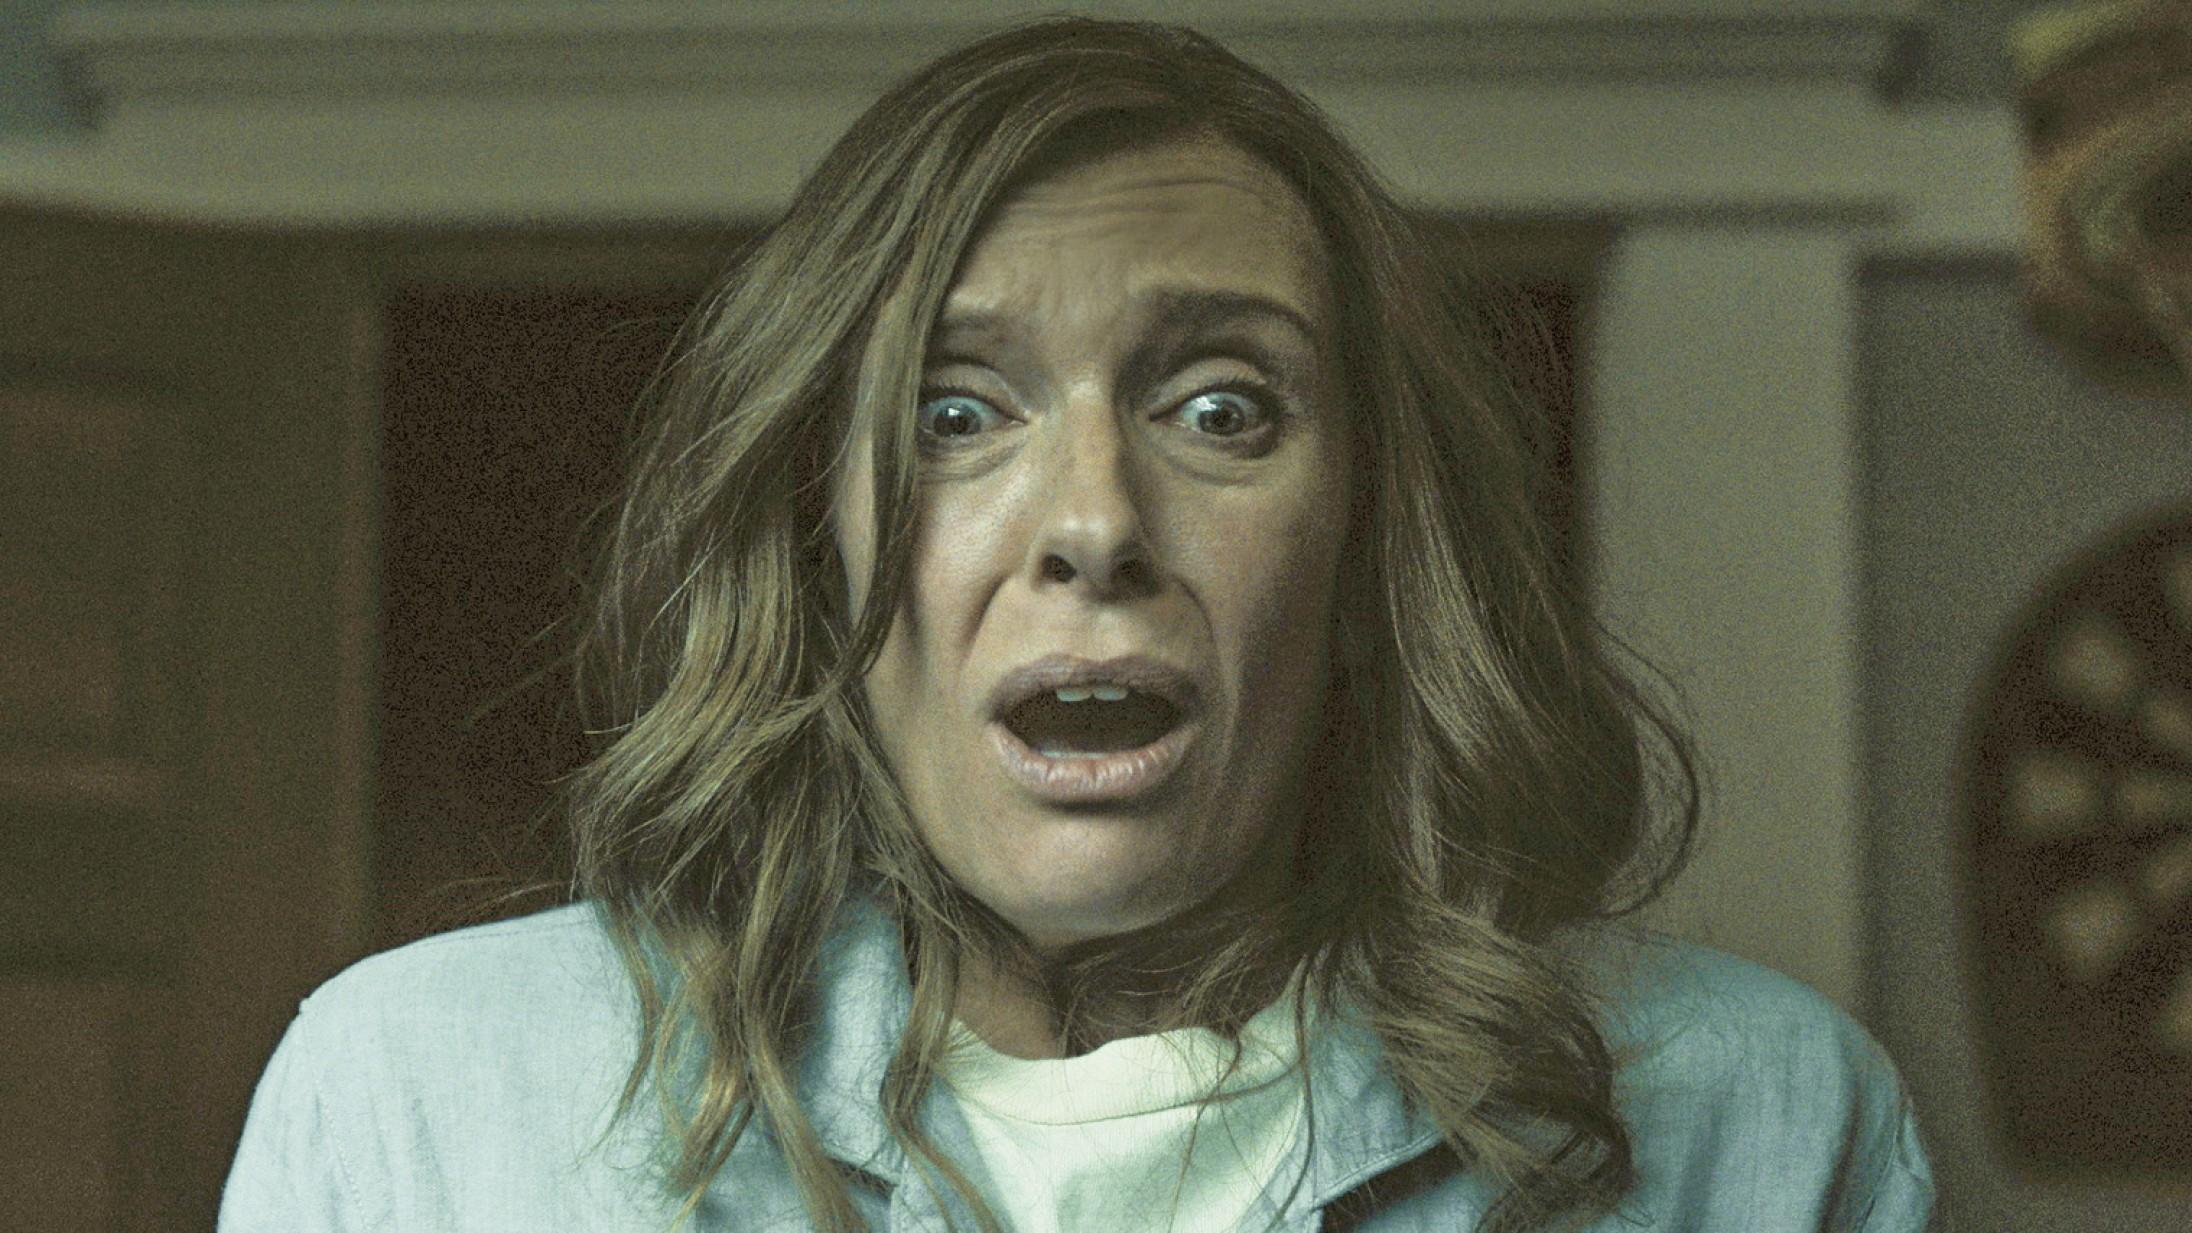 Filmene, der har redefineret horrorgenren de seneste år – og hvor du kan streame dem